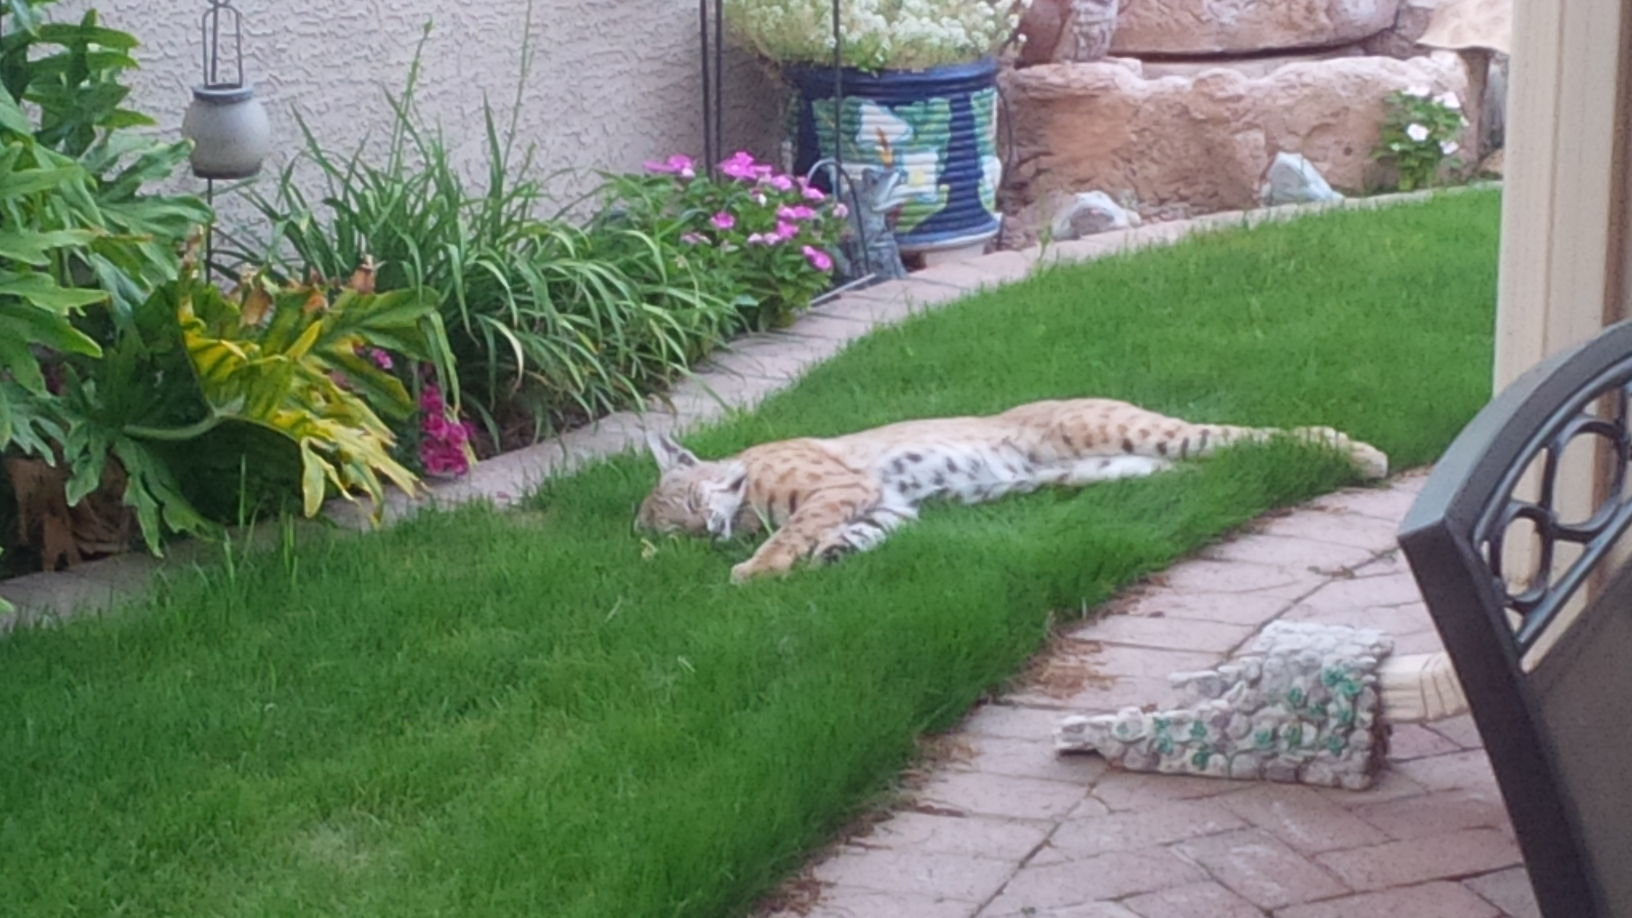 Roaming through Southern Arizona Photos of backyard